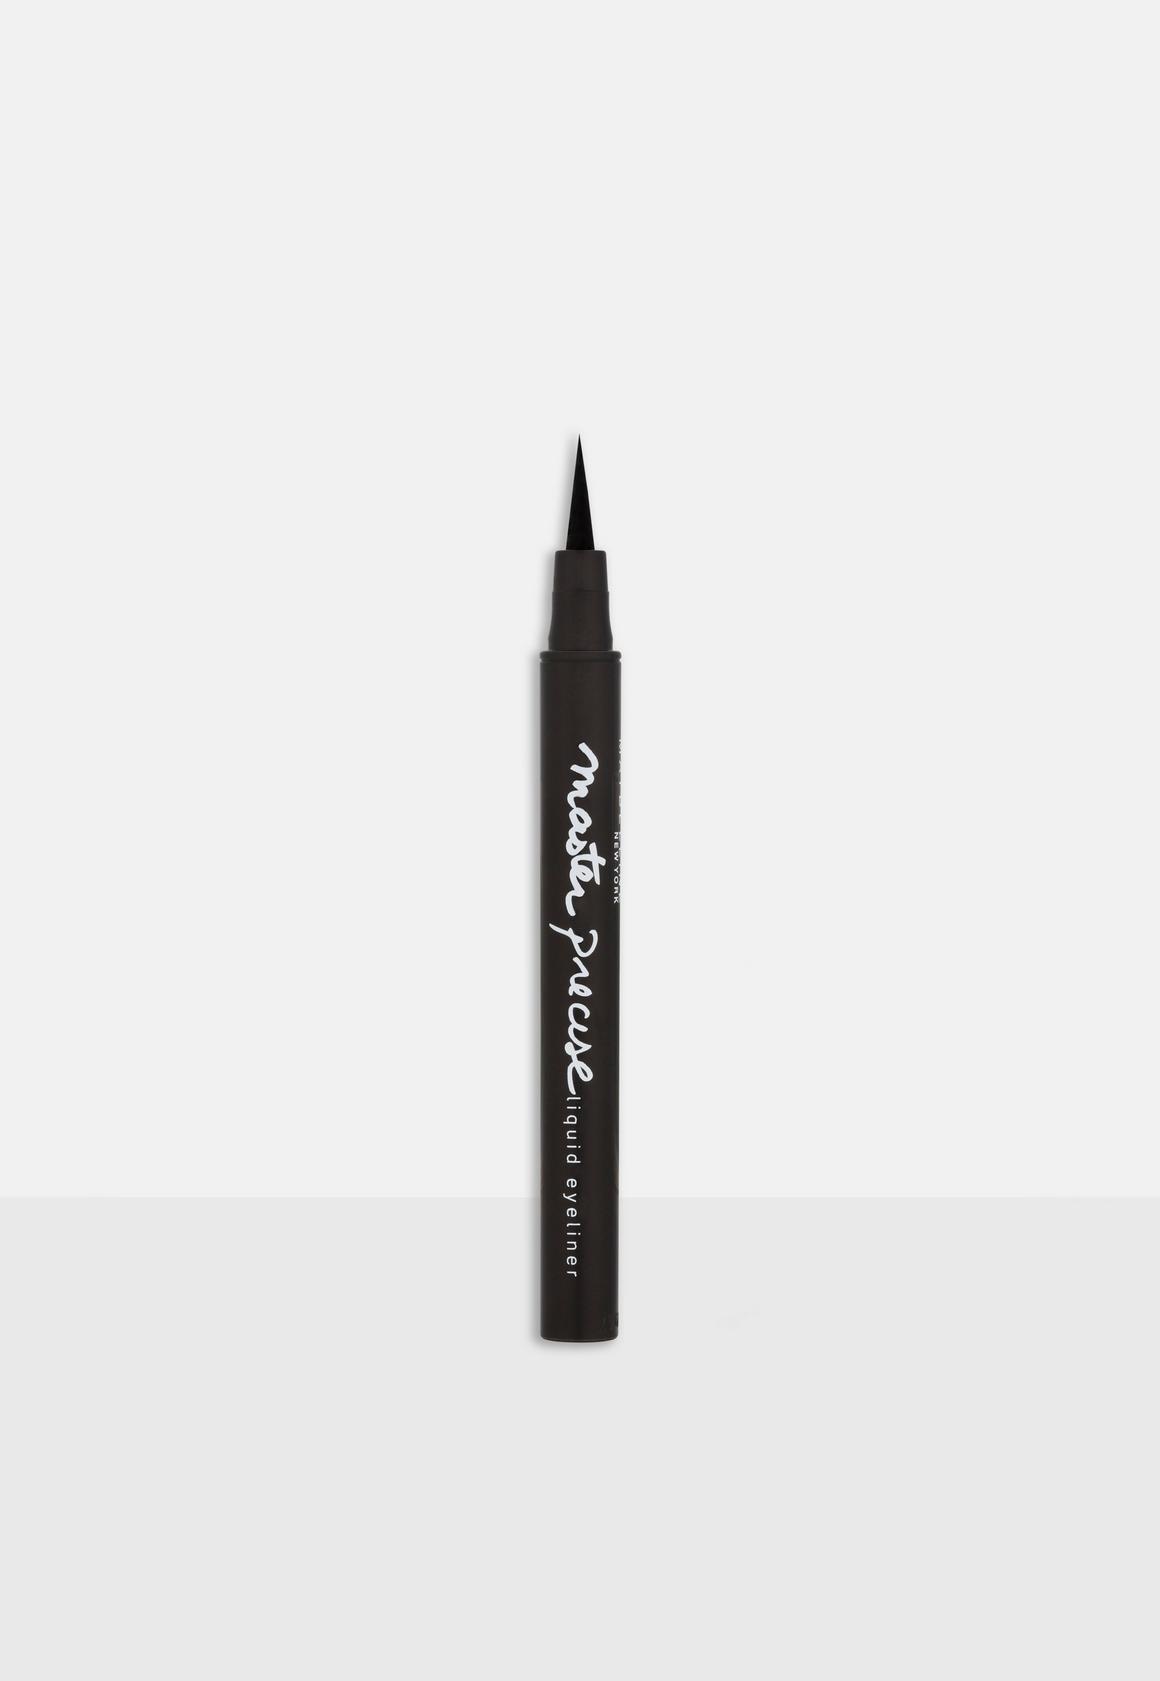 Missguided - Liner feutre Maybelline Master Precise noir - 1